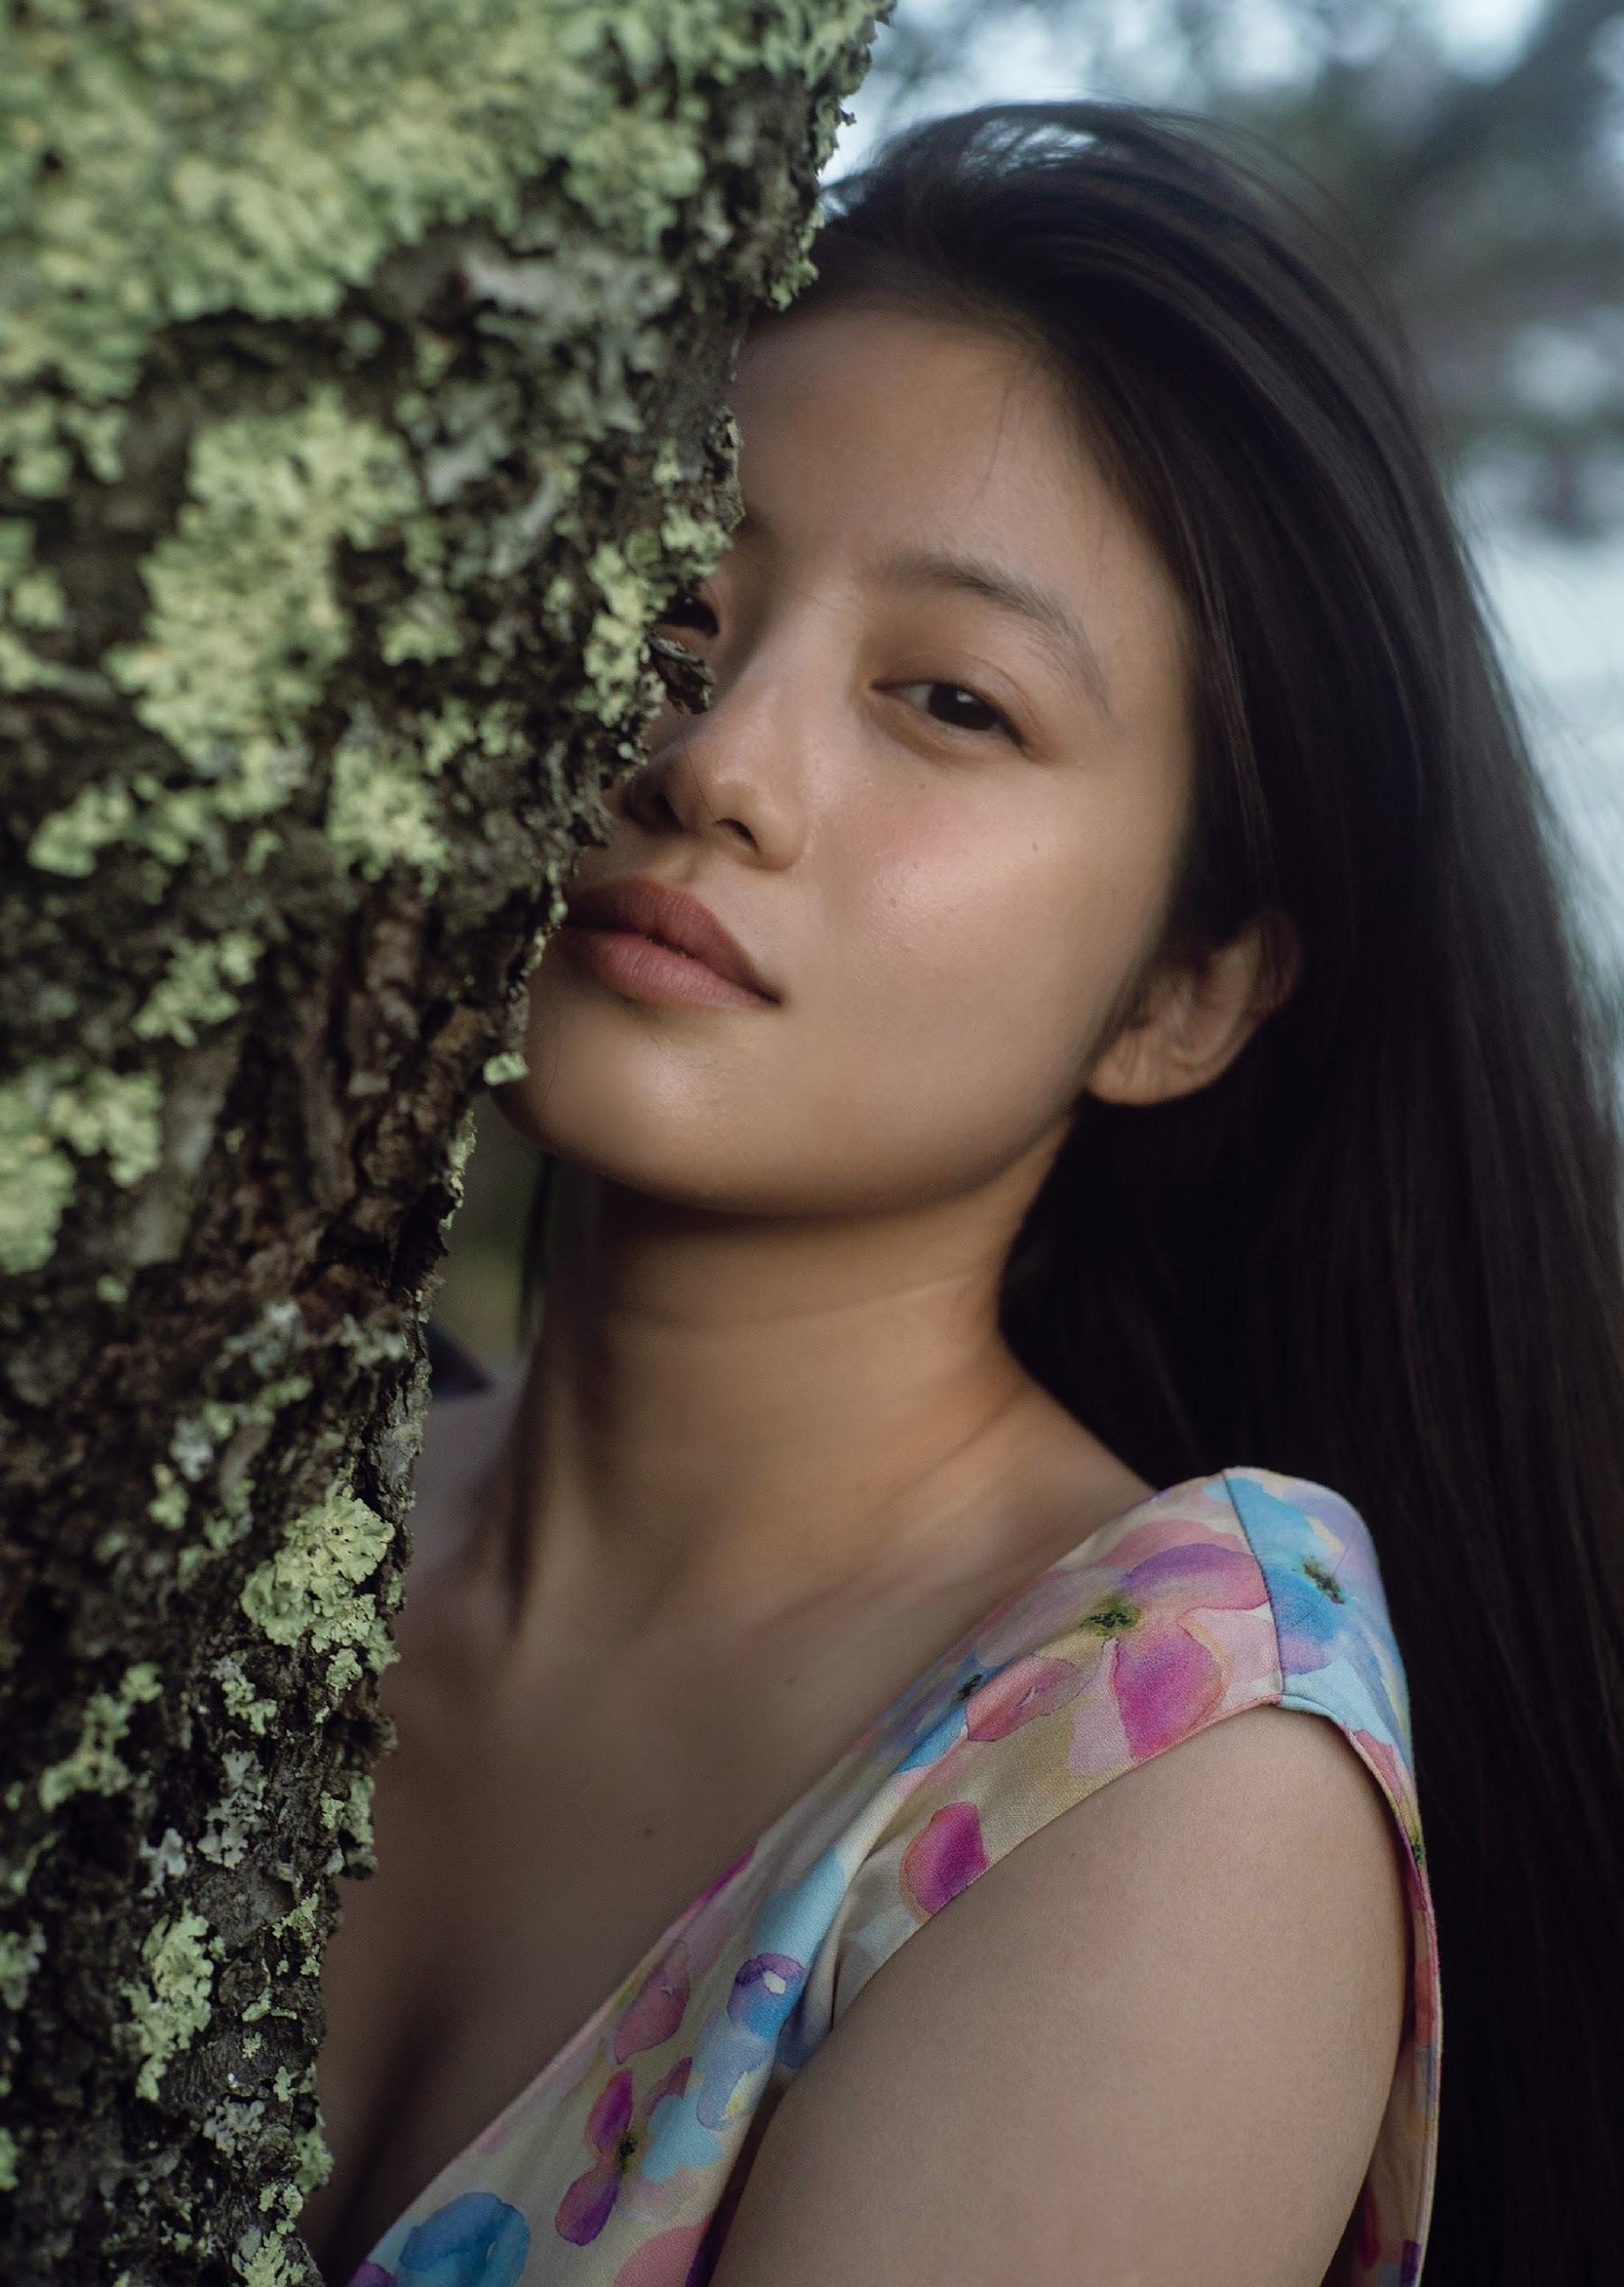 今田美樱-WEEKLY PLAYBOY 2021年第二十四期  高清套图 第7张